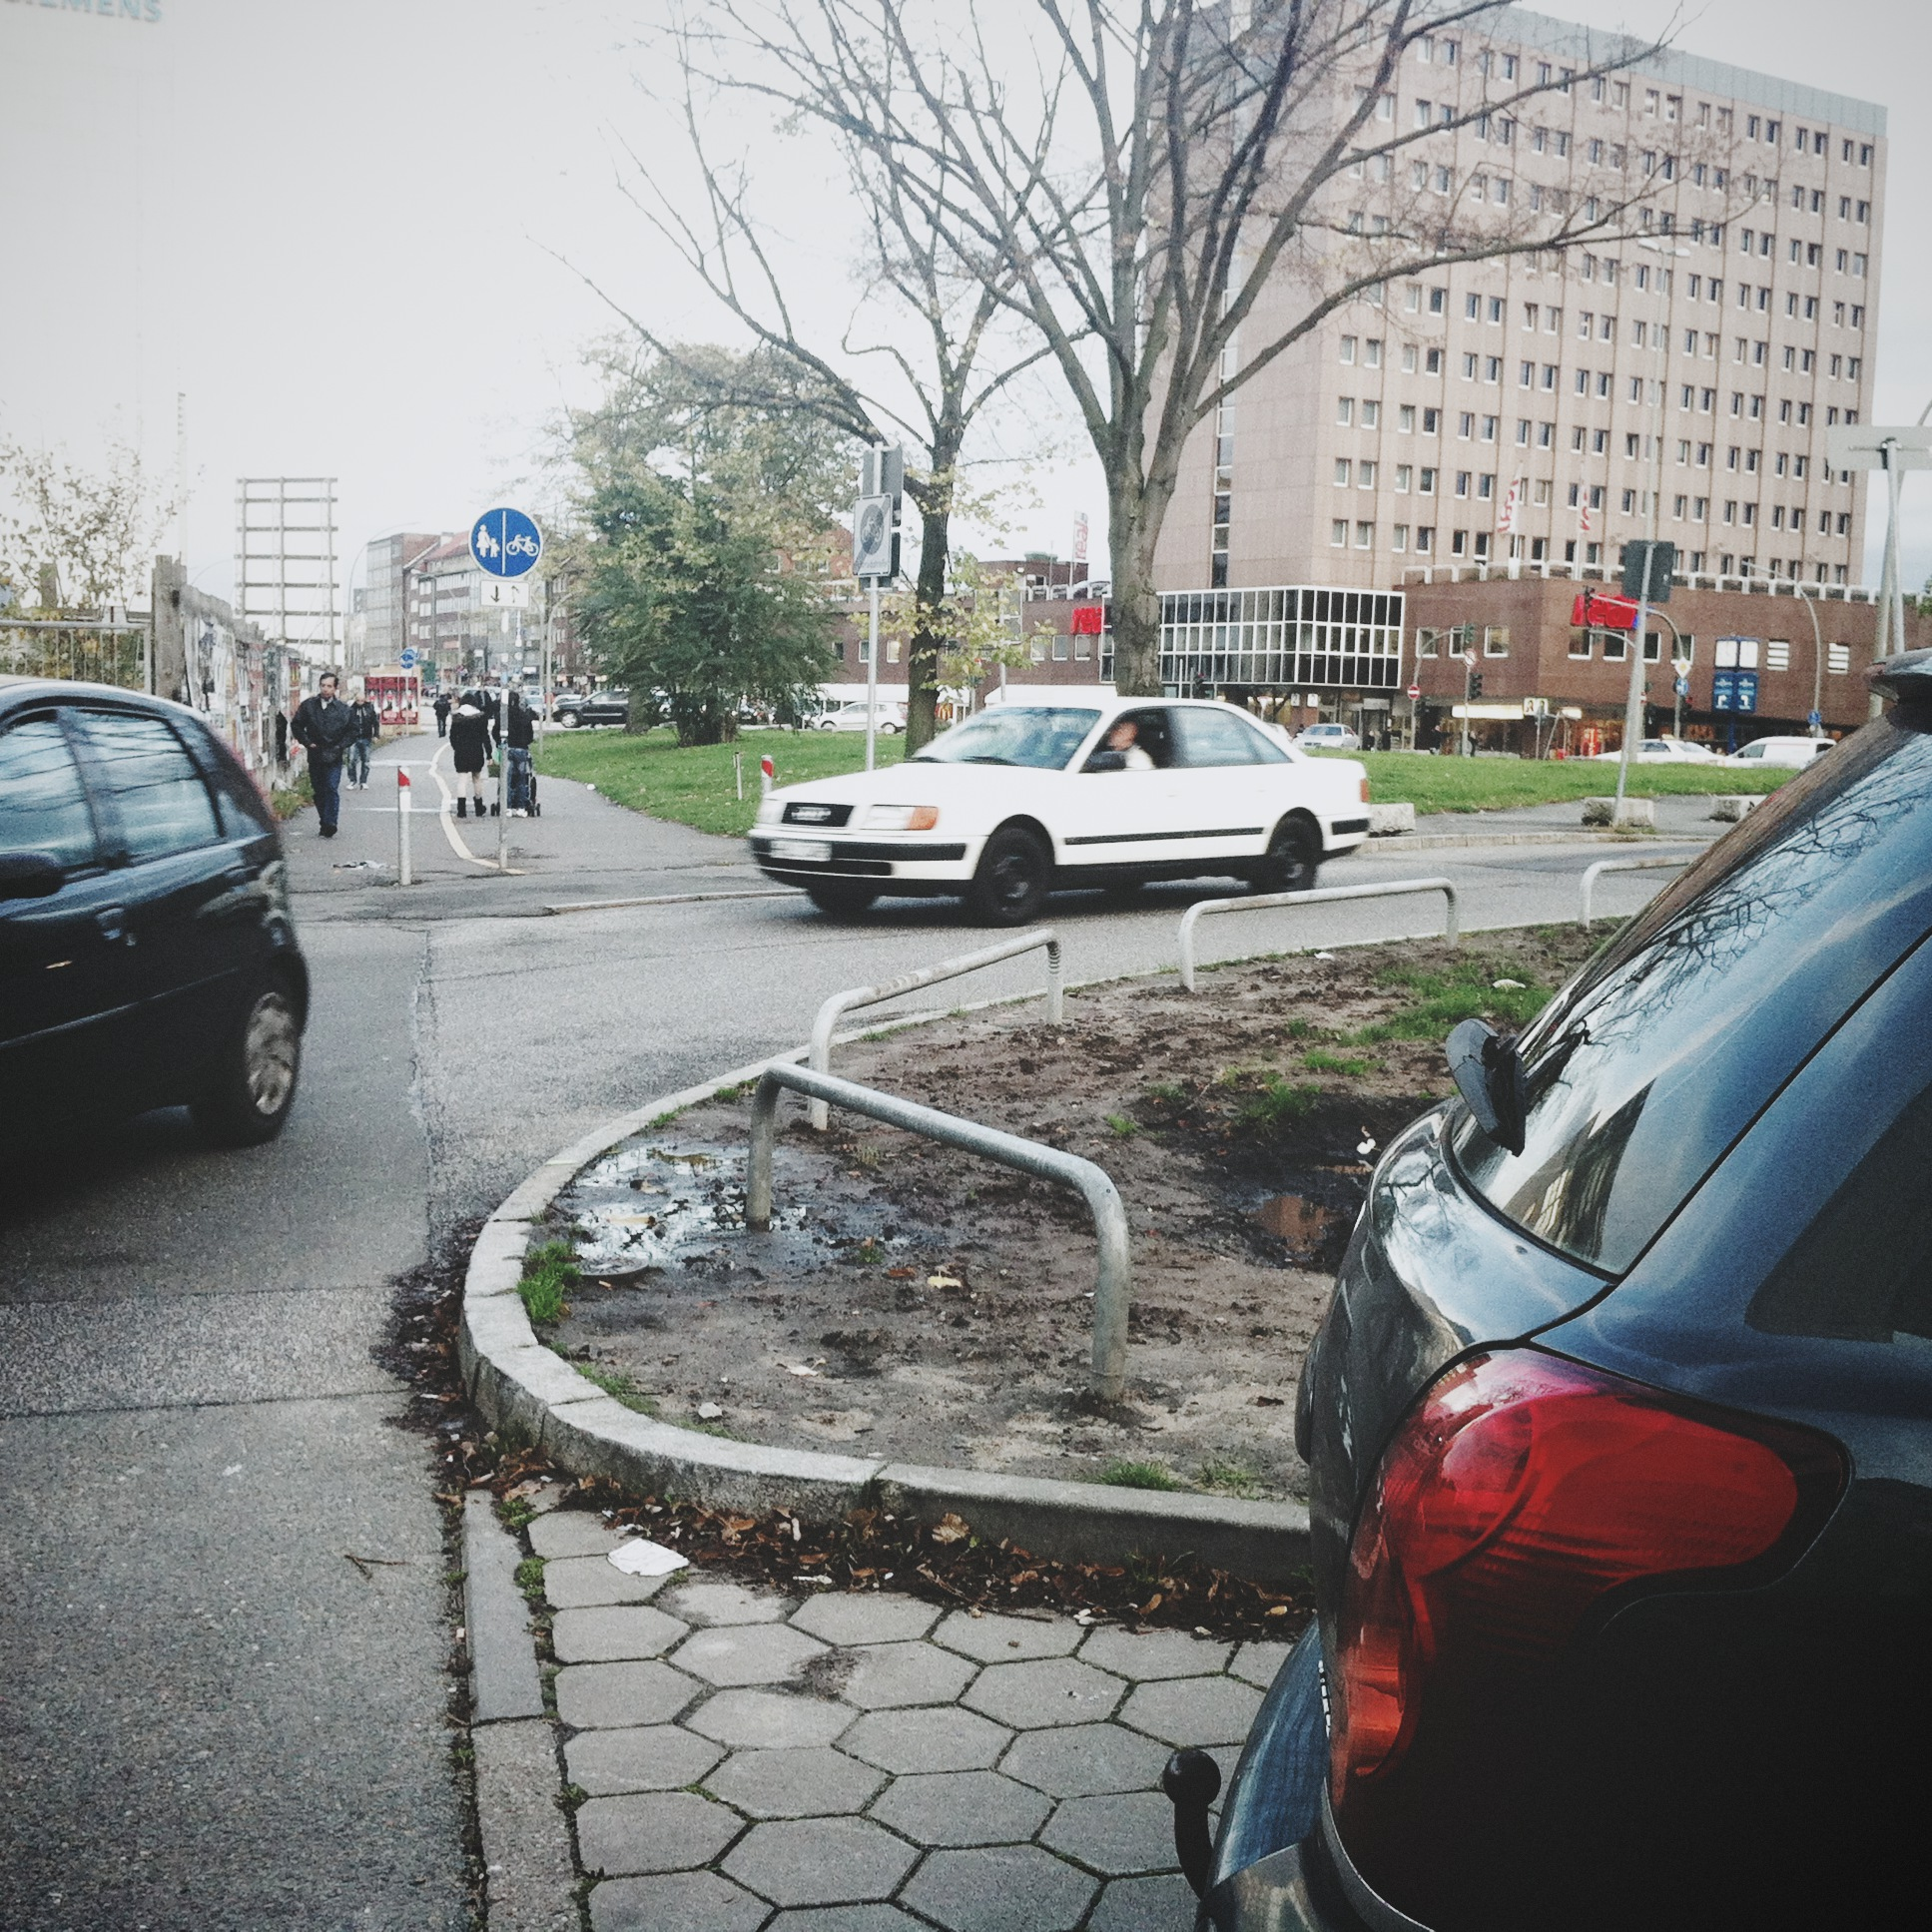 veloroute8_adenauerallee-hamburg-fahrradstrasse_radpropaganda-5